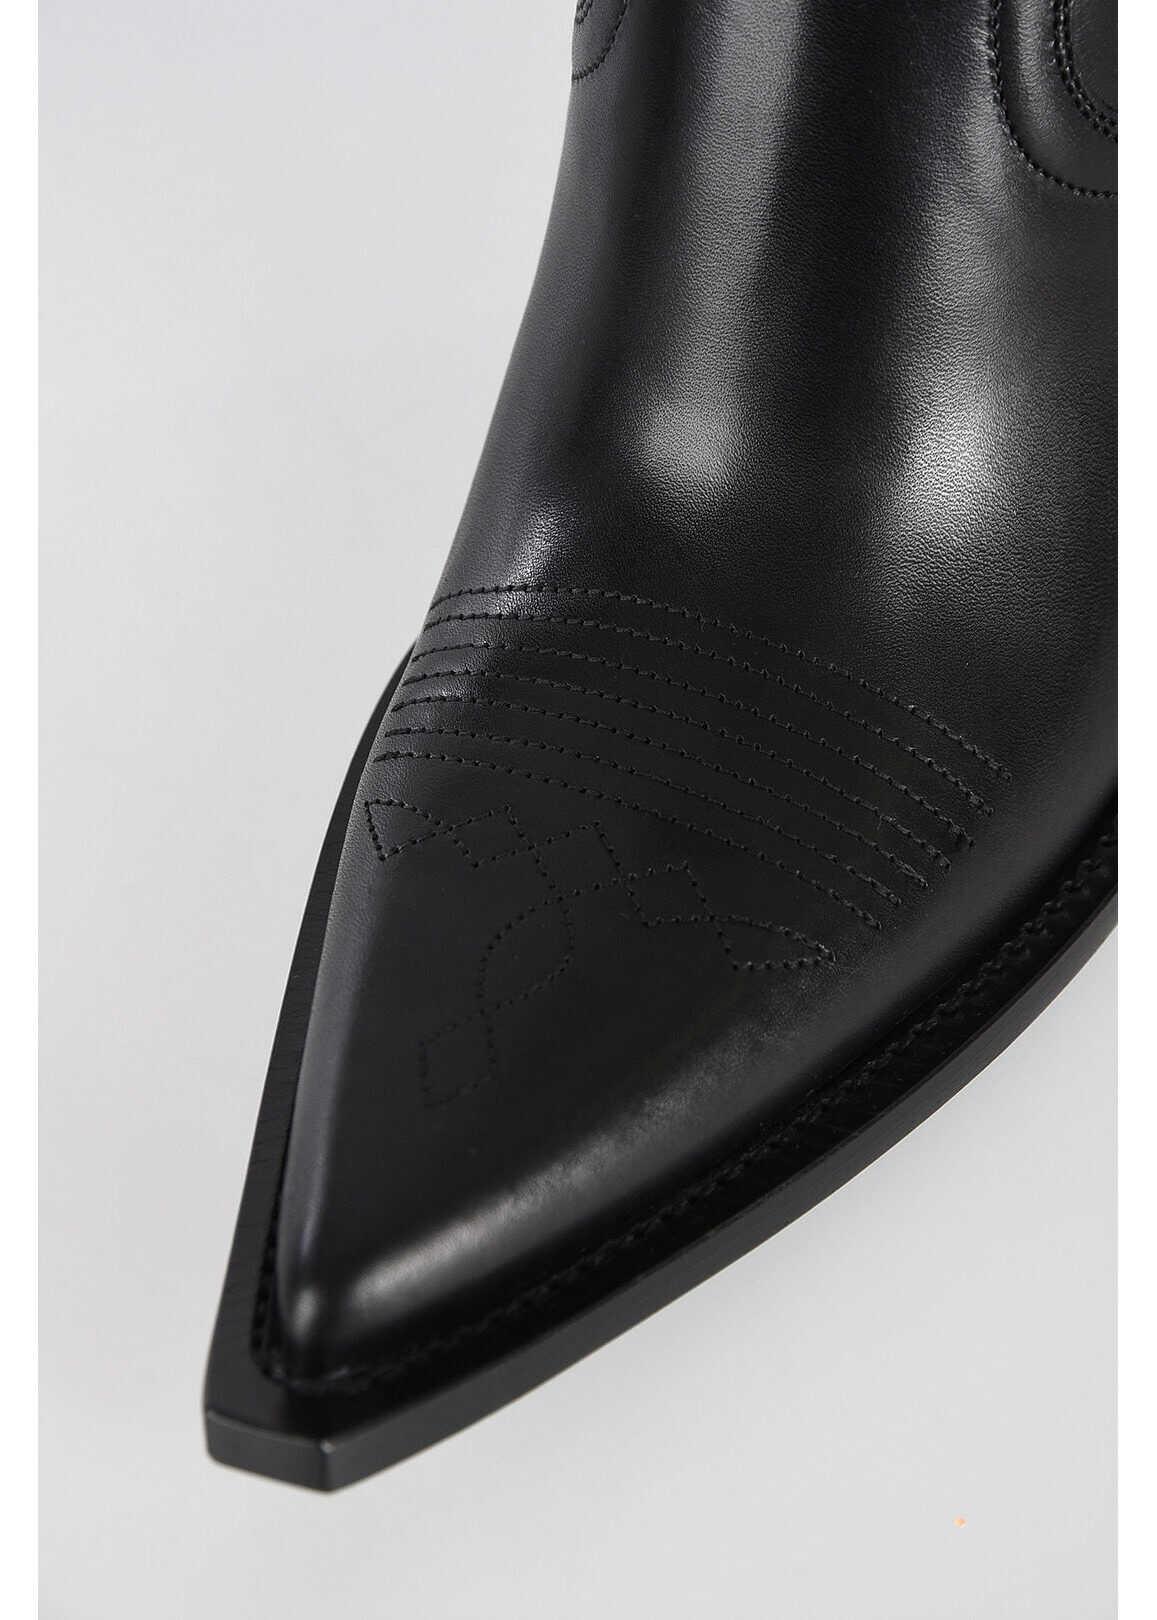 Maison Margiela MM22 Leather RANCHERO Sandal BLACK